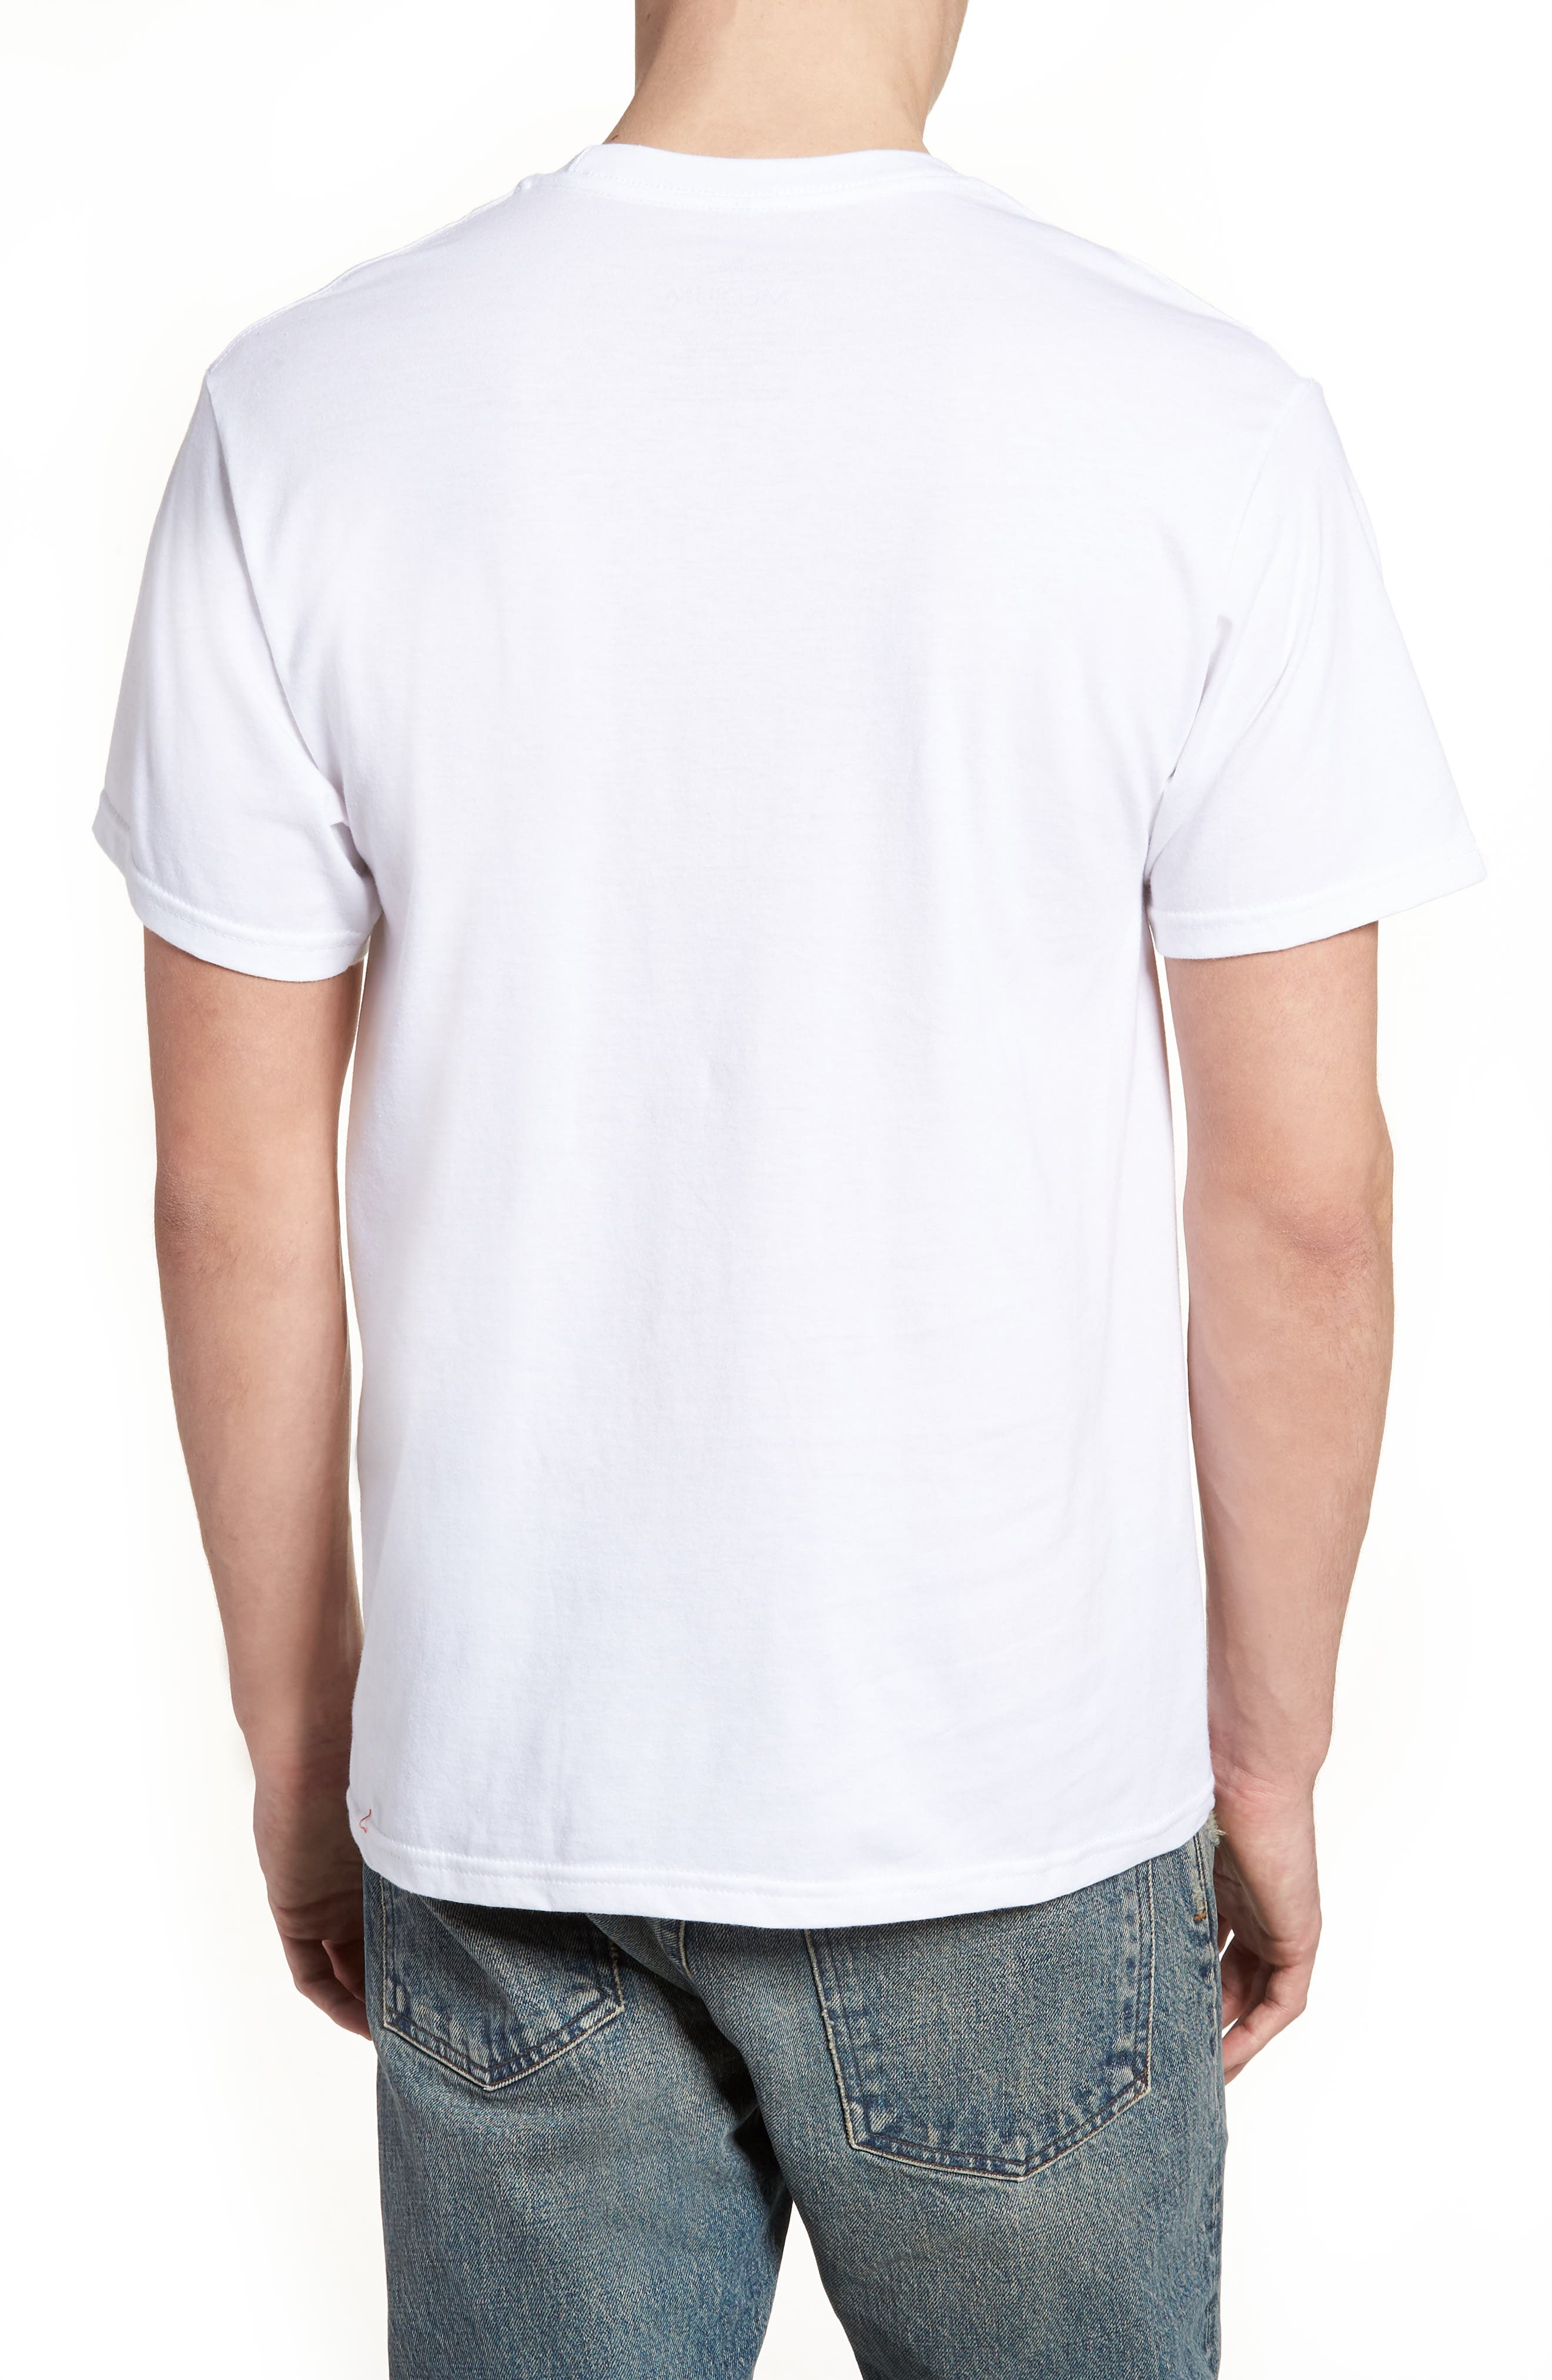 Shinanigans Graphic T-Shirt,                             Alternate thumbnail 2, color,                             White